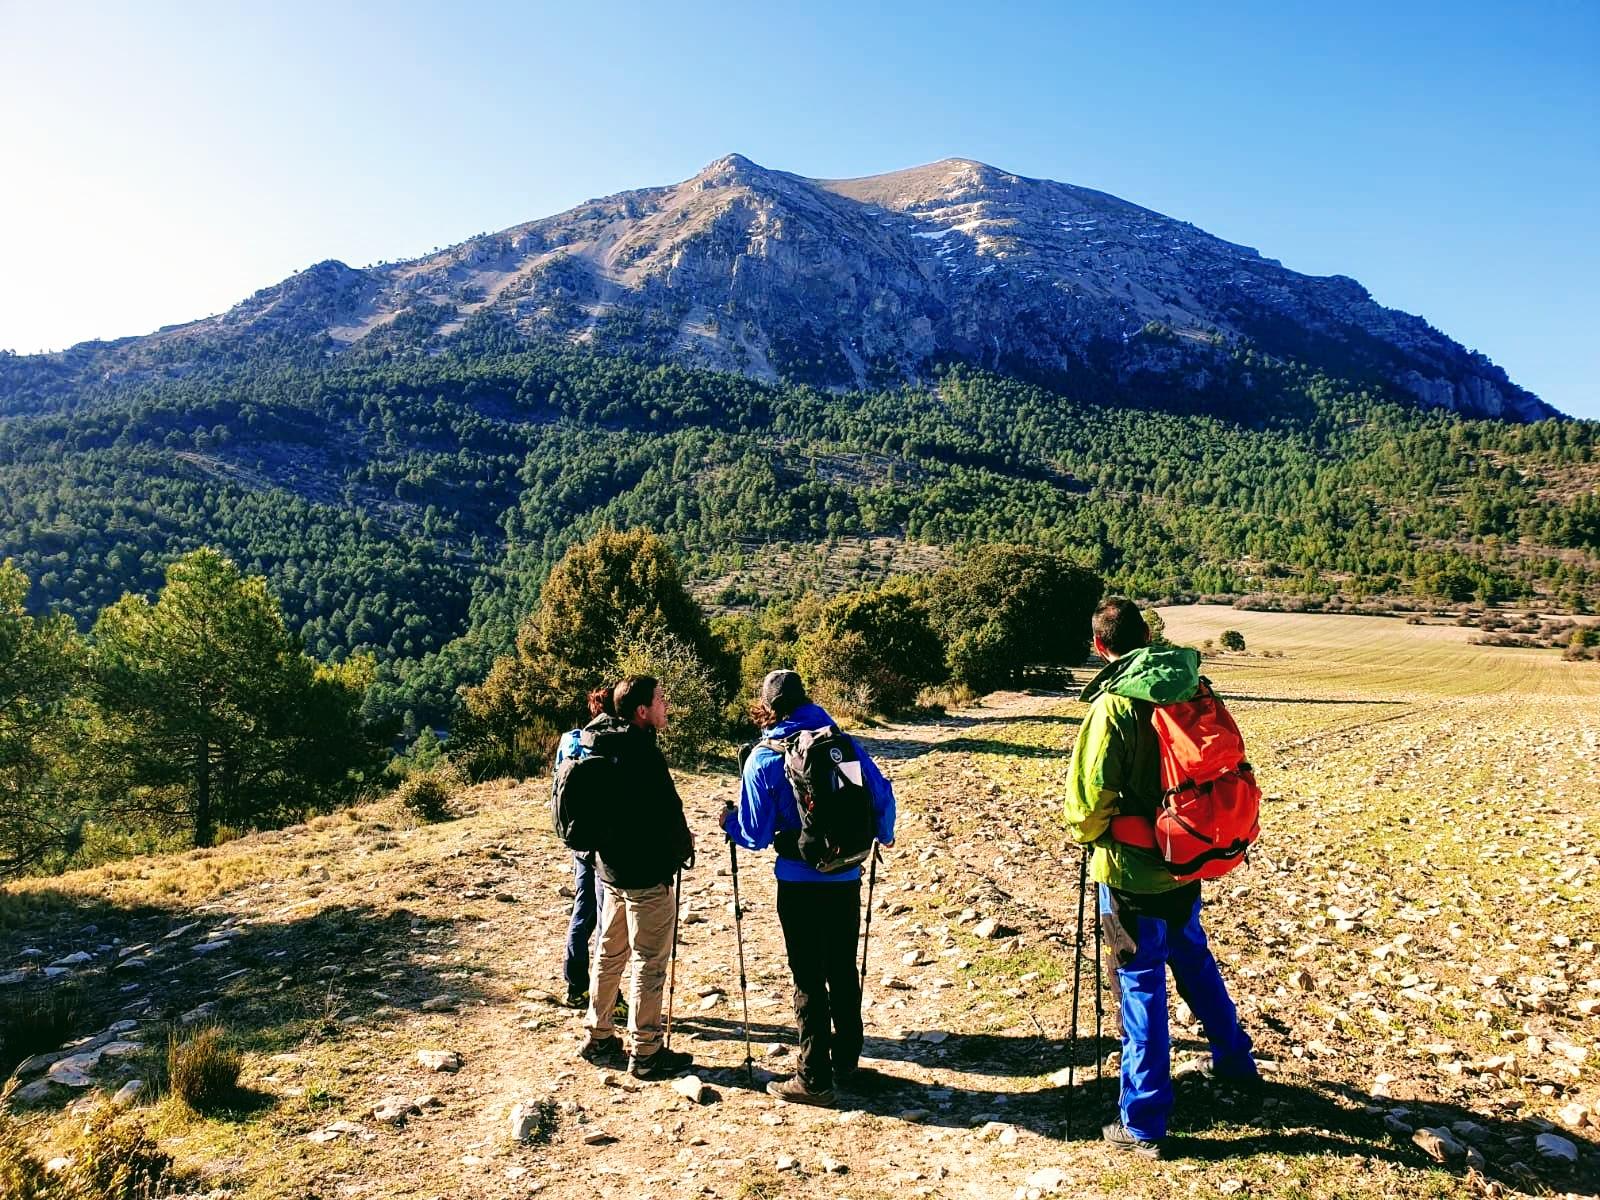 turismo activo ecoturismo altiplano granada senderismo